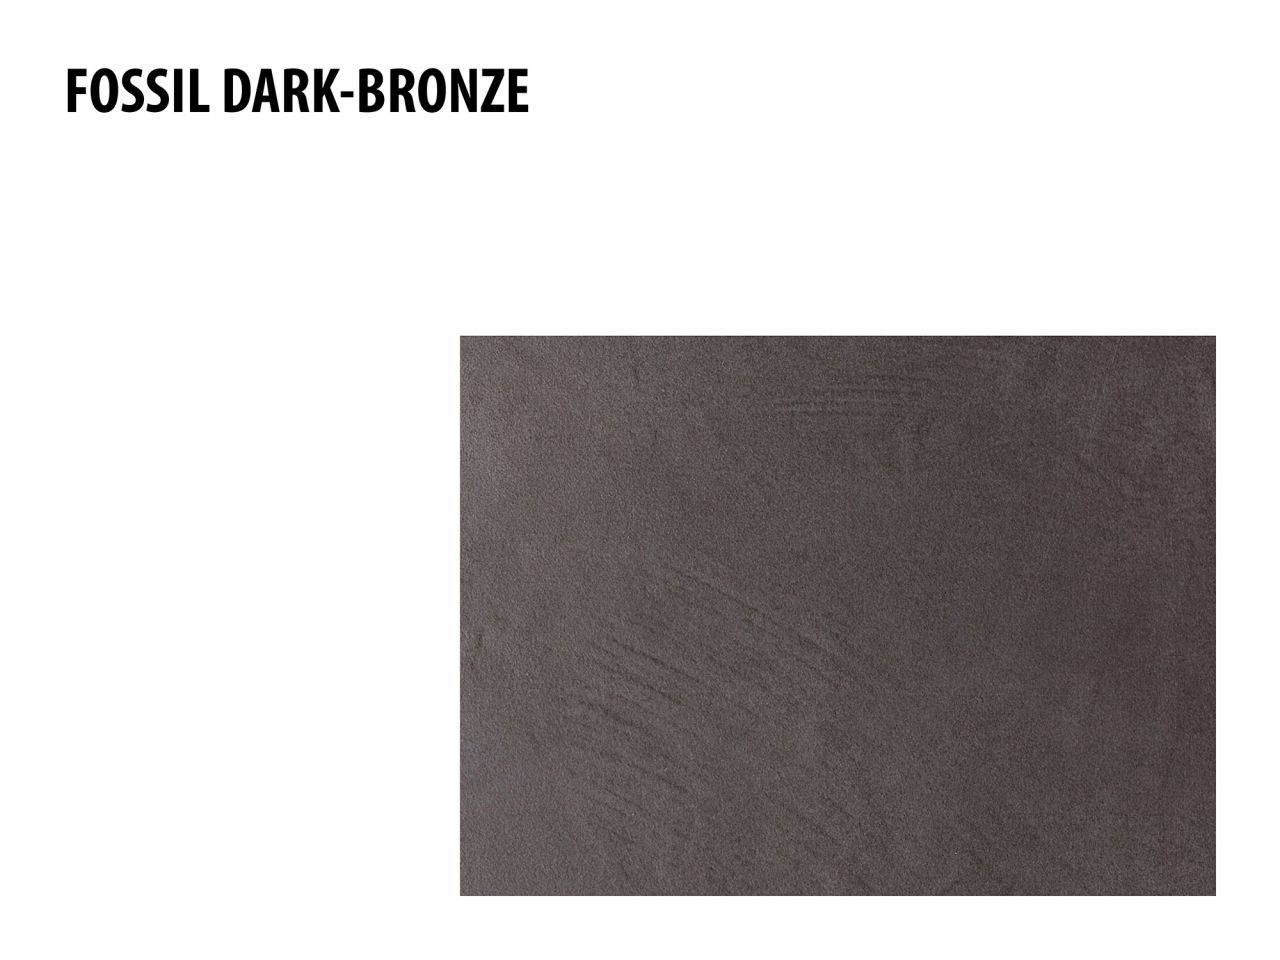 Solpuri Keramik Fossil Dark-Bronze